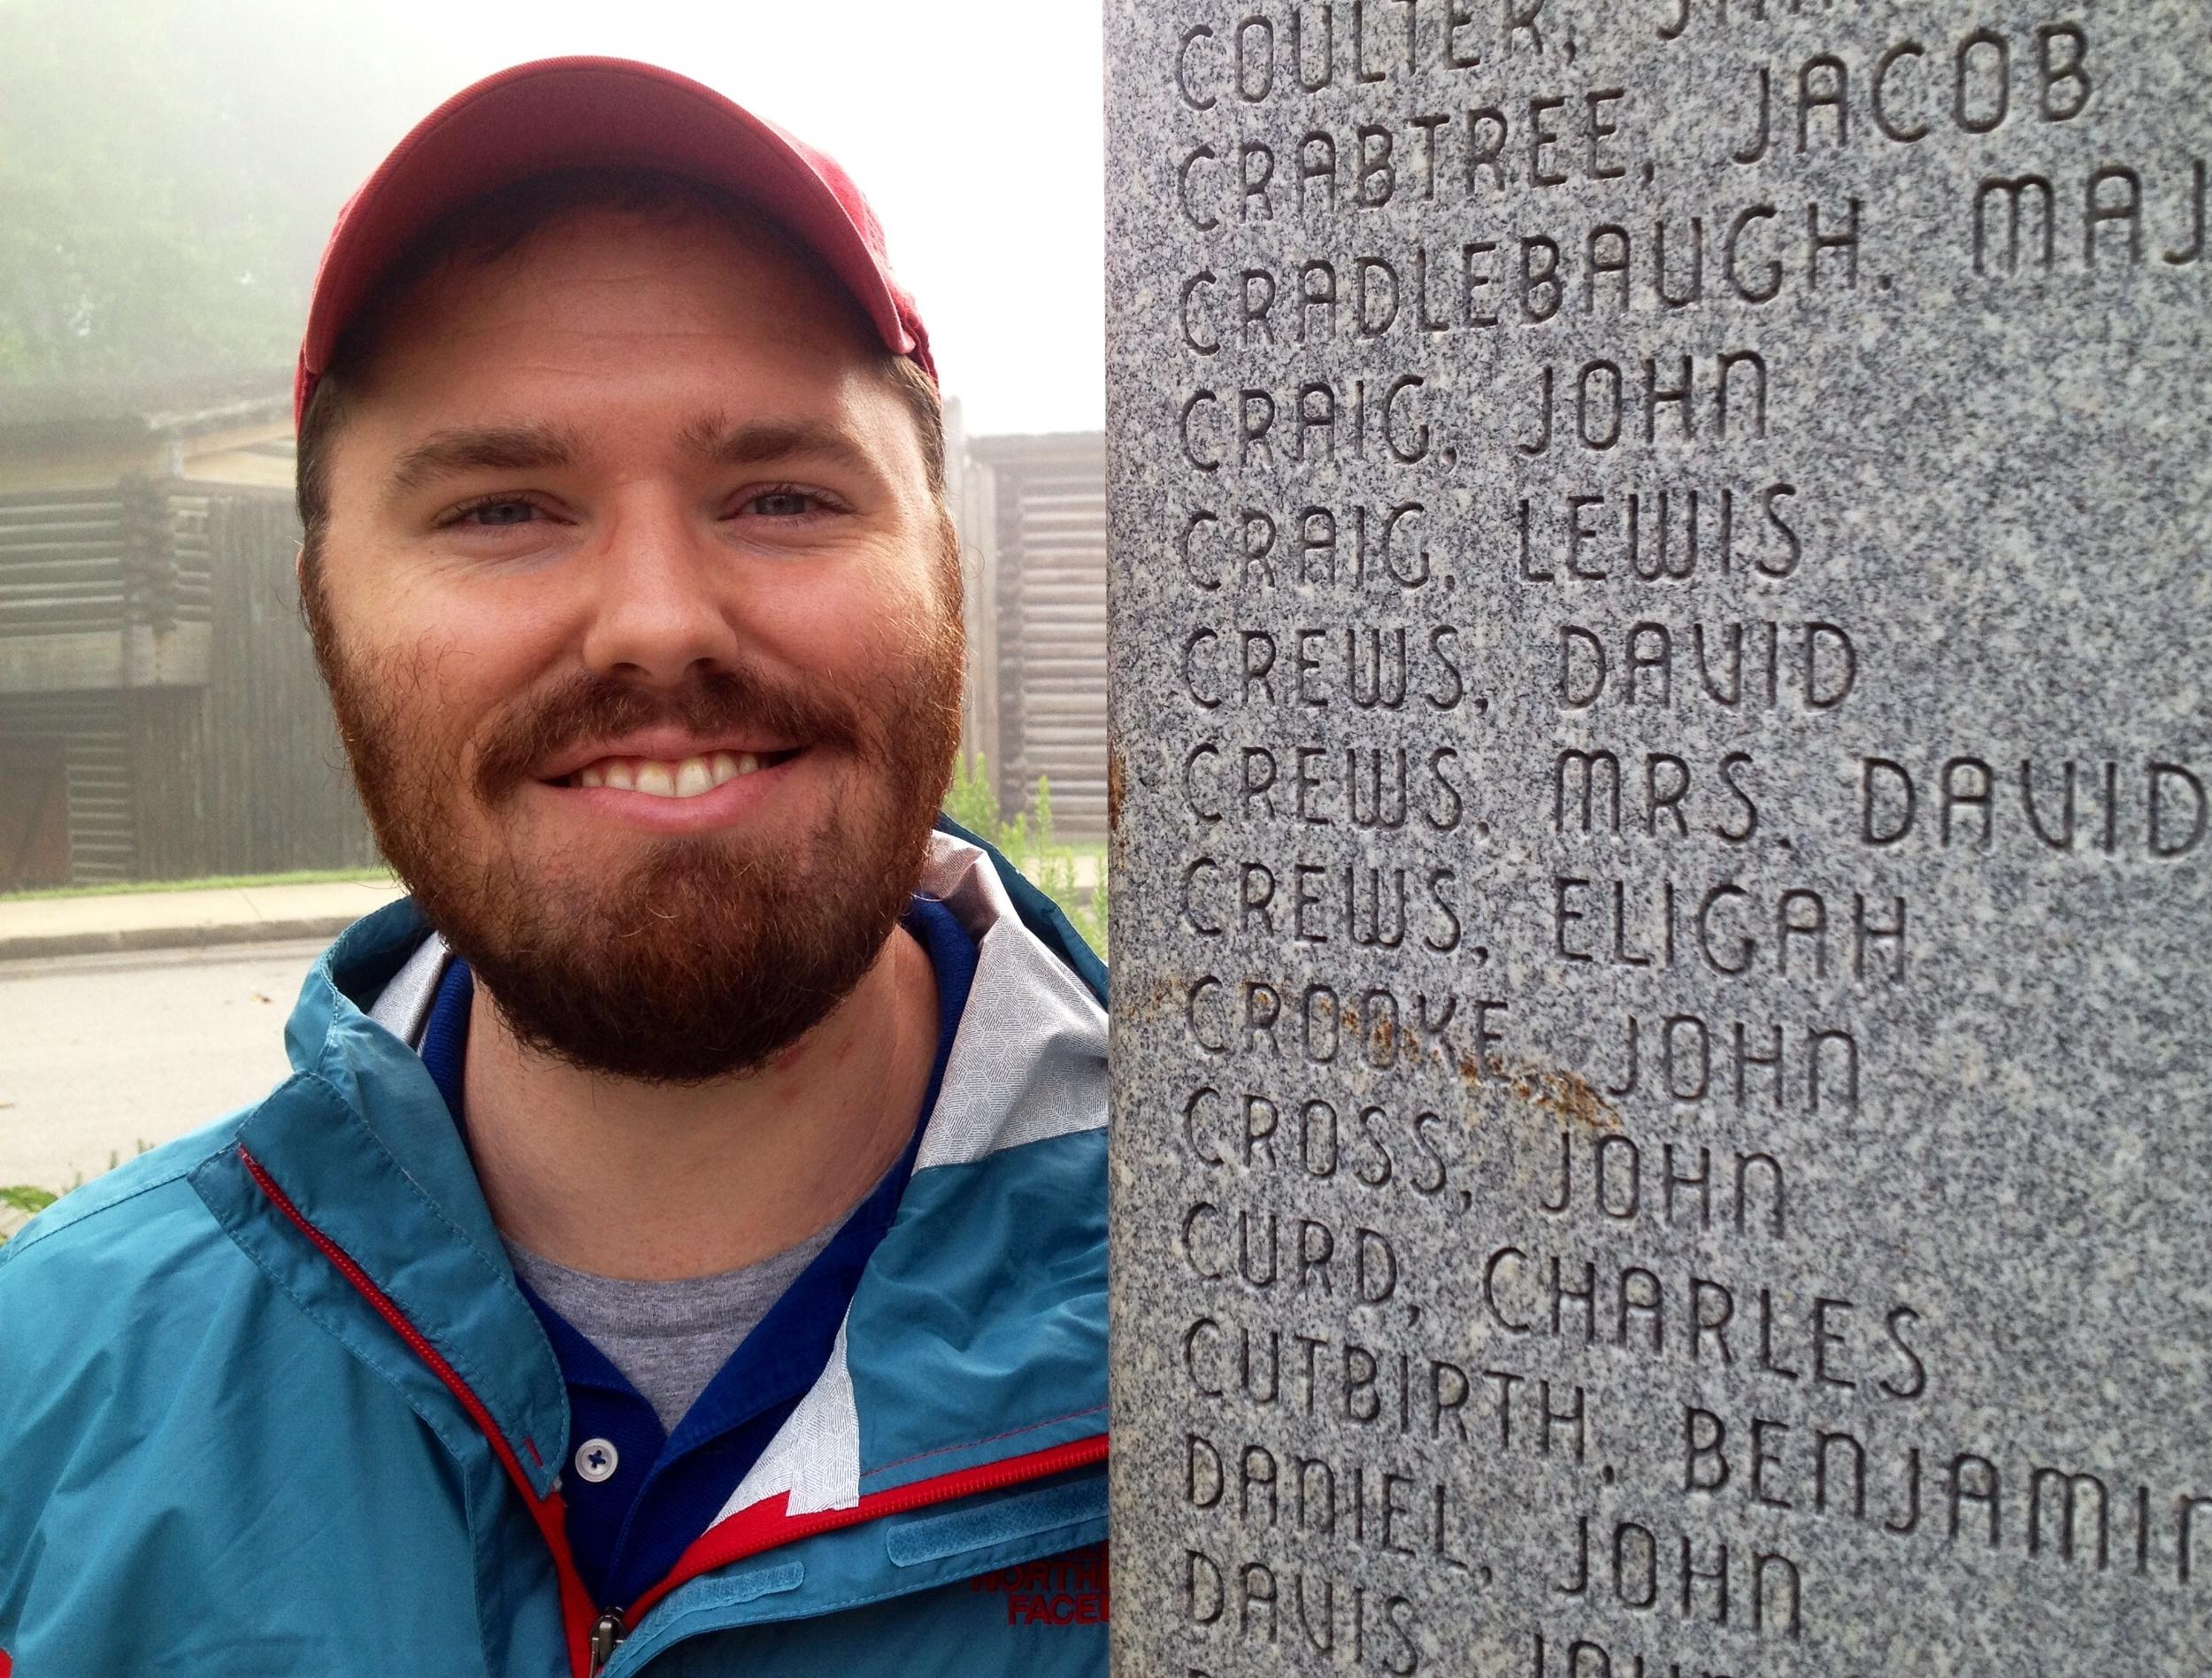 Apparently, John gave money to erect this obelisk back in 1981.